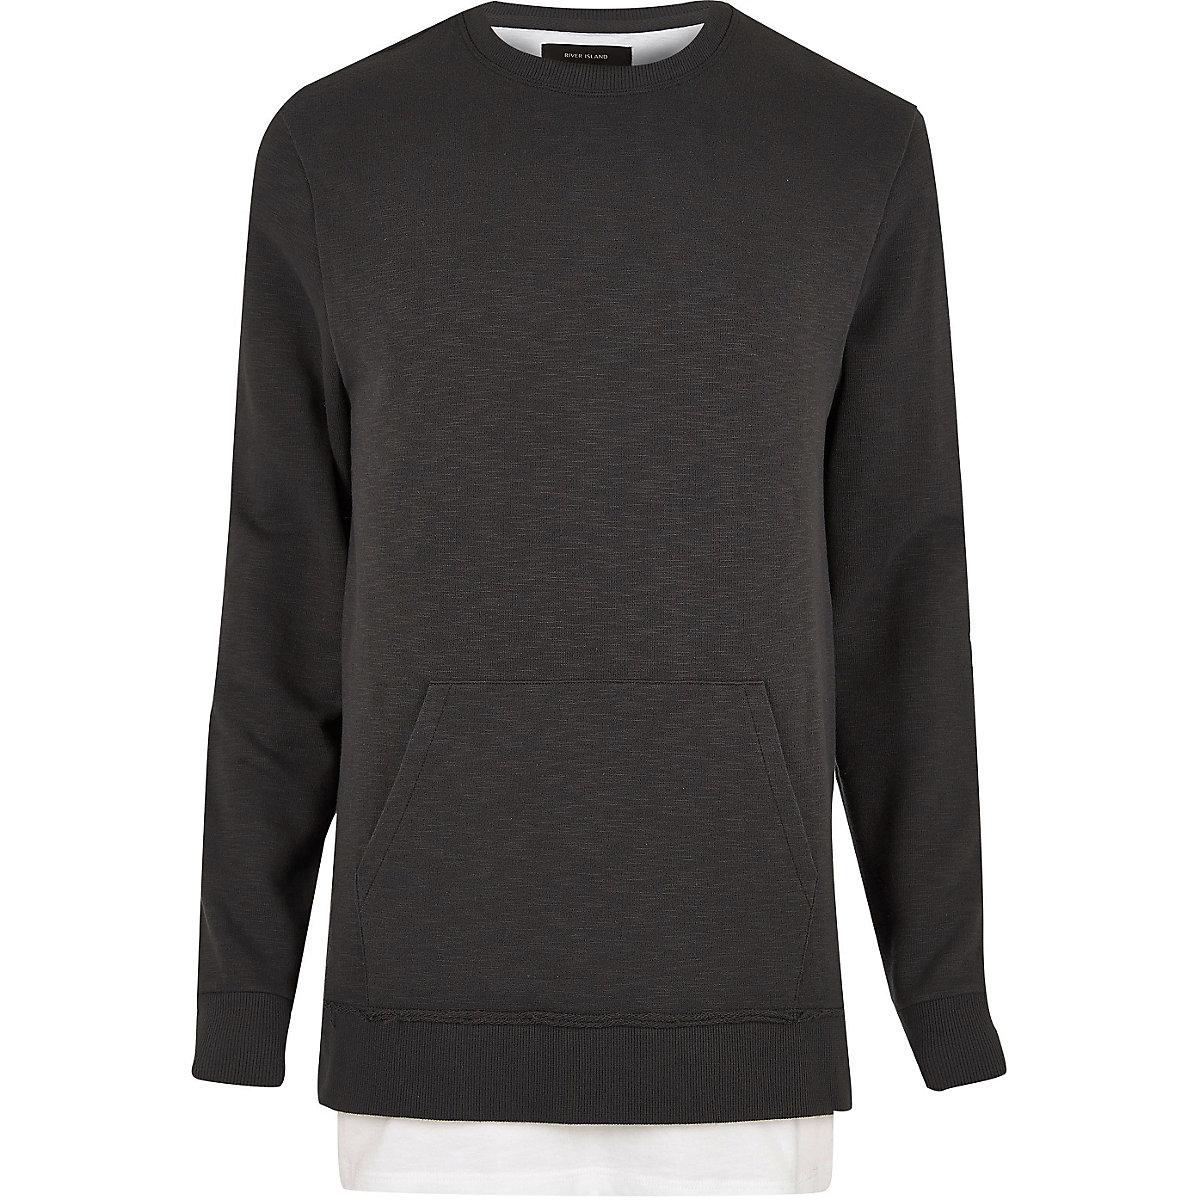 Black washed layered longline sweatshirt